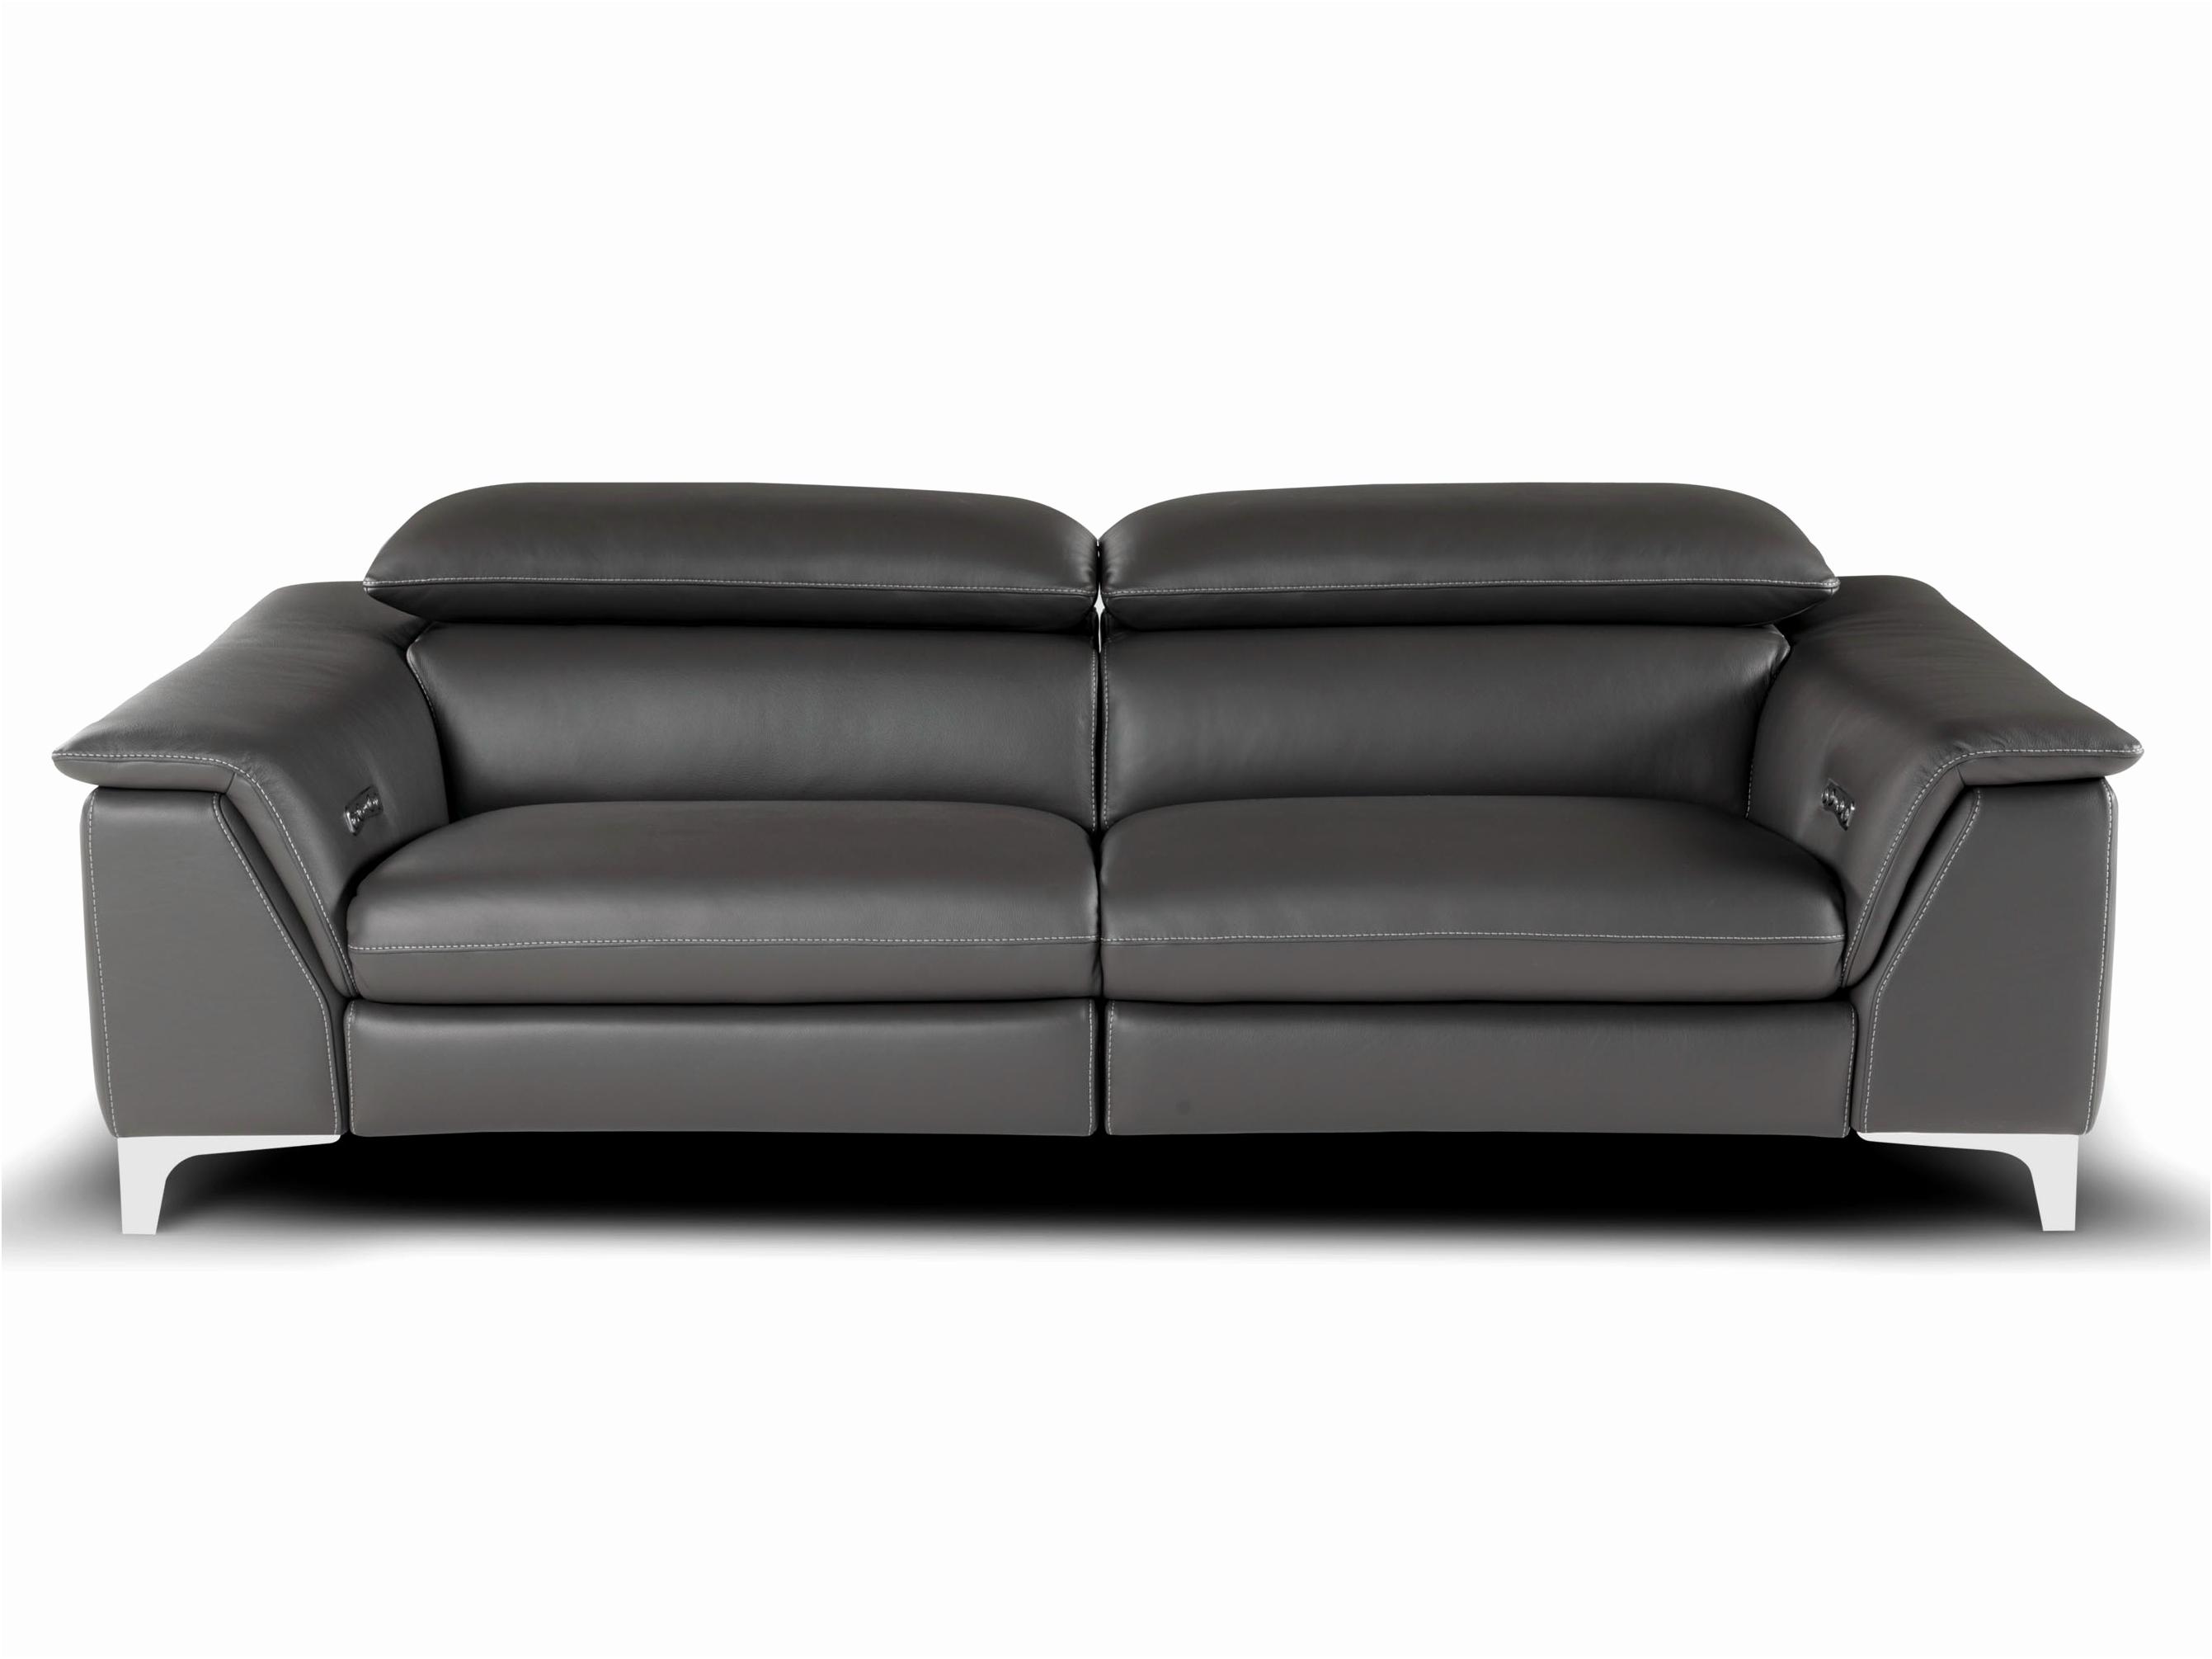 Berkline Sofas With Regard To Current Unique Berkline Leather Sofa Elegant – Intuisiblog (Gallery 19 of 20)